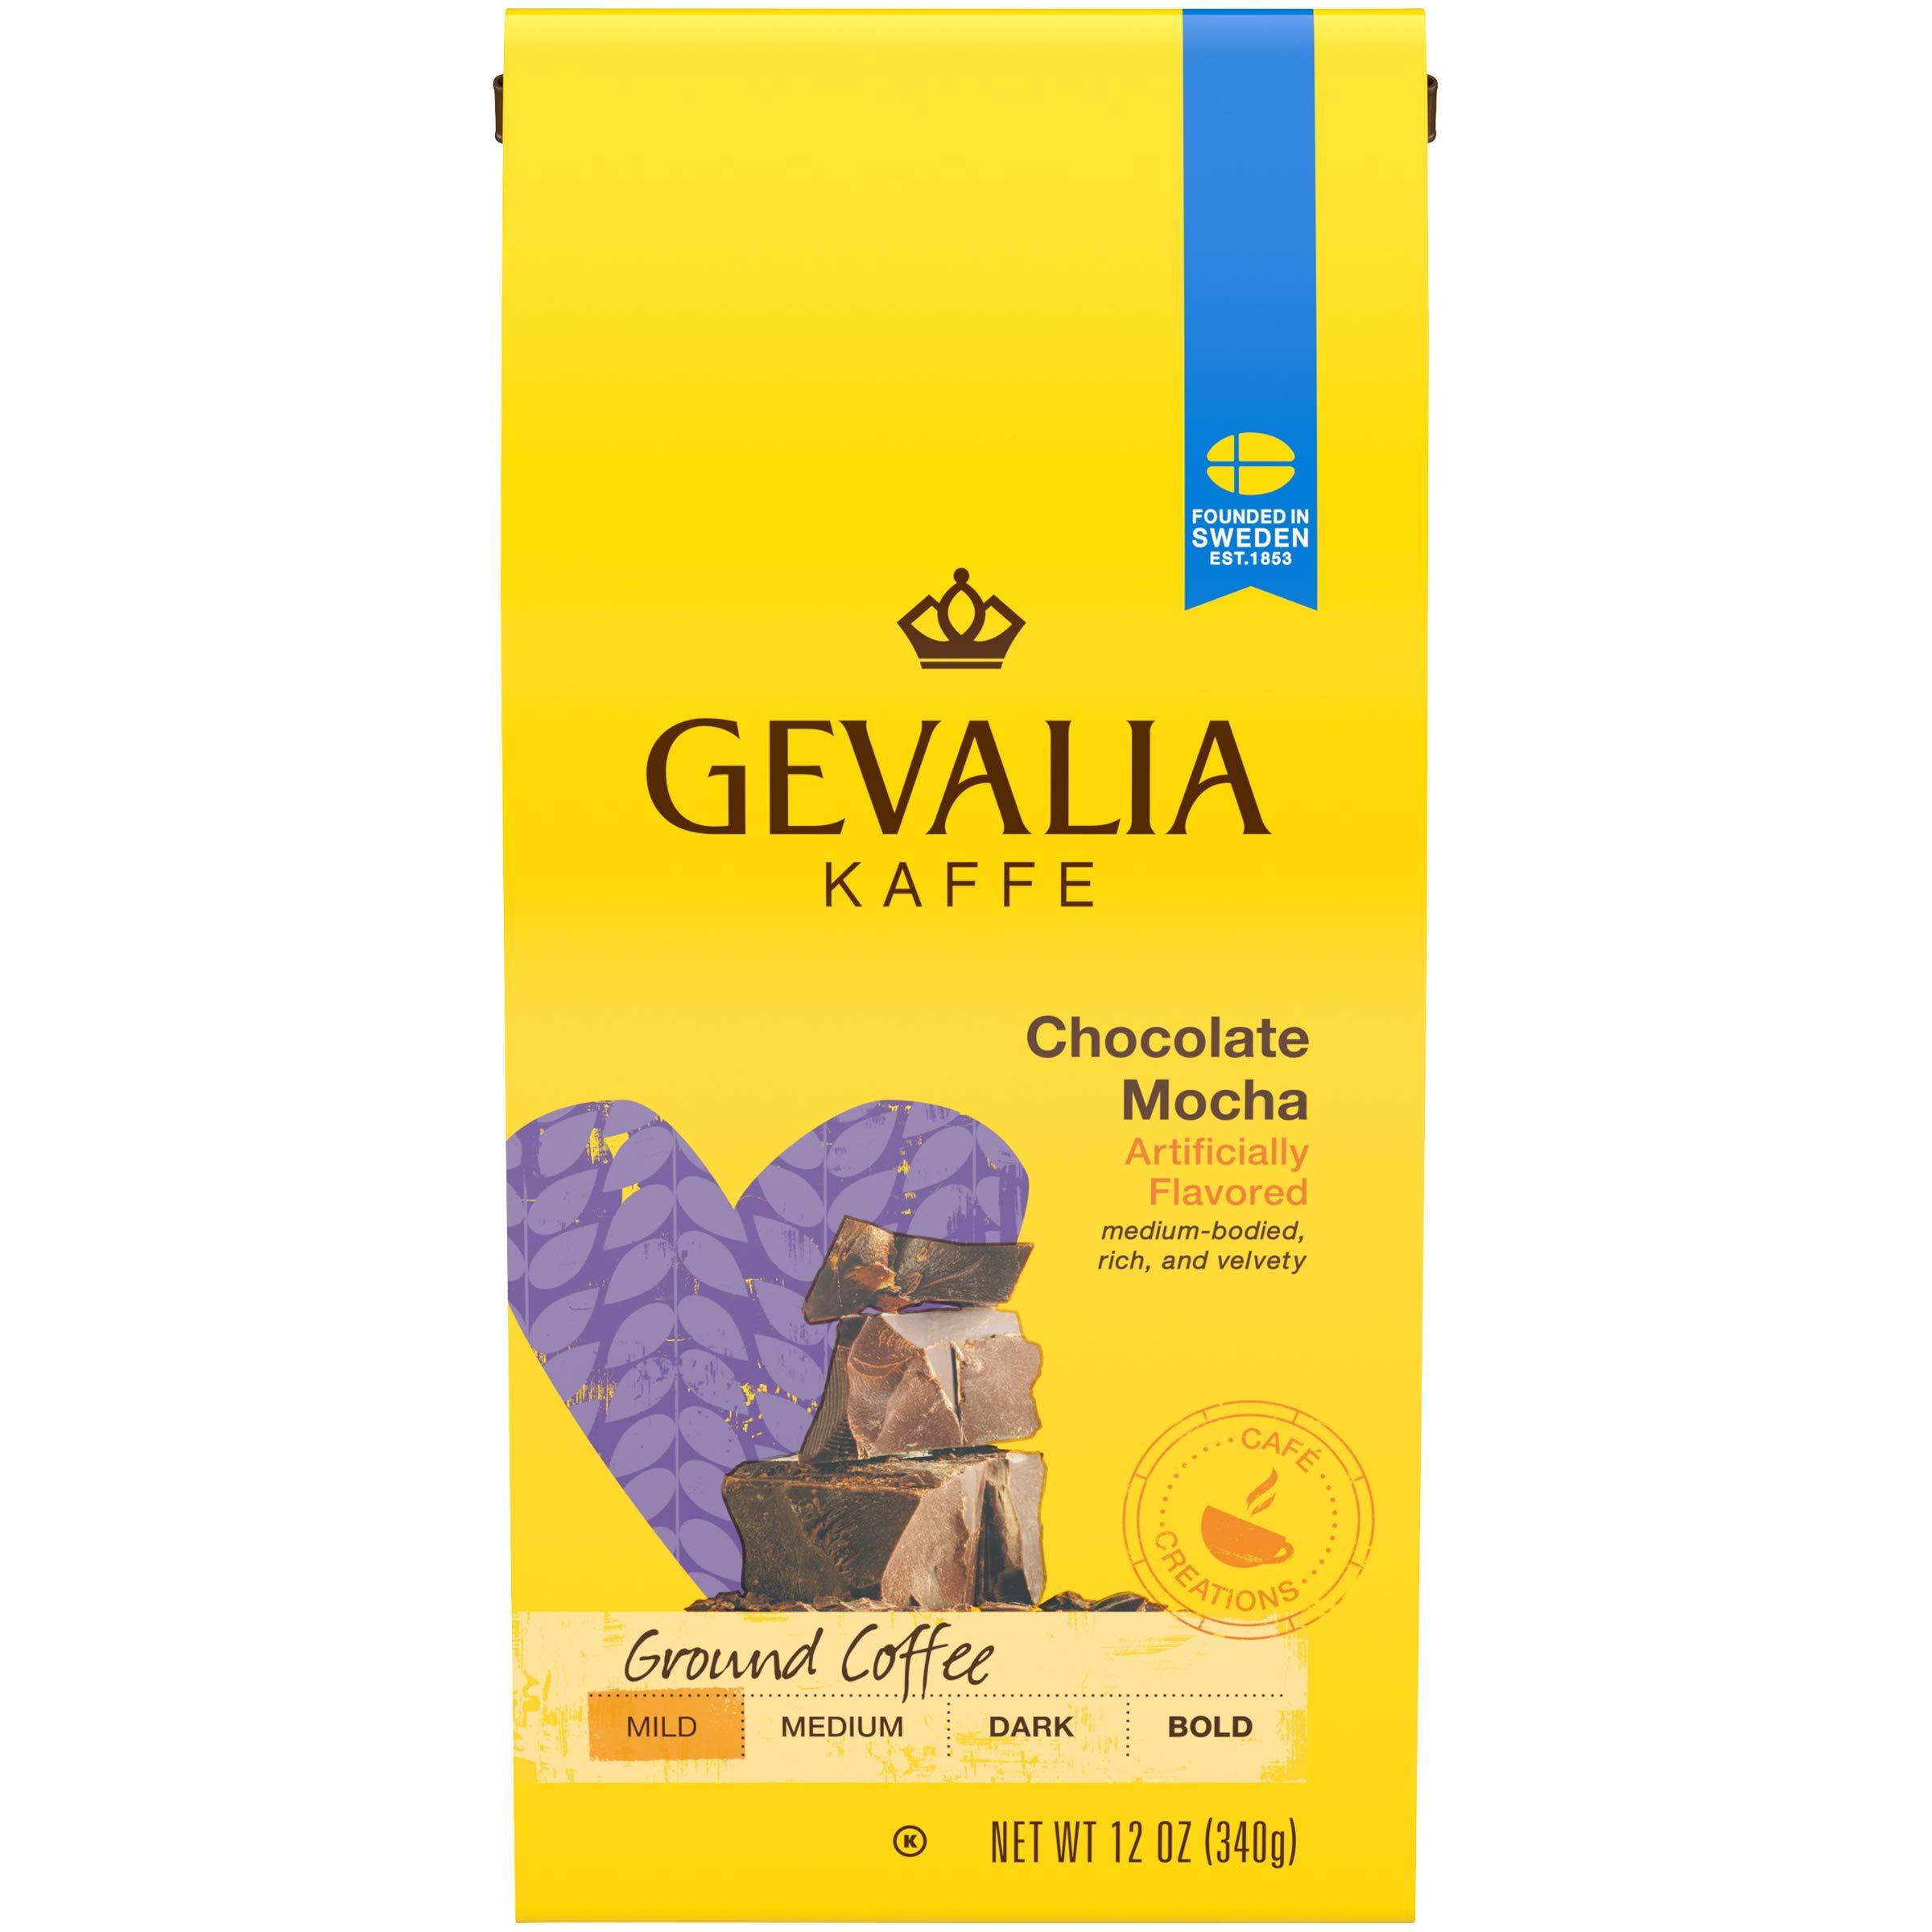 Gevalia Chocolate Mocha Ground Coffee (12 oz Bags, Pack of 6) by Gevalia